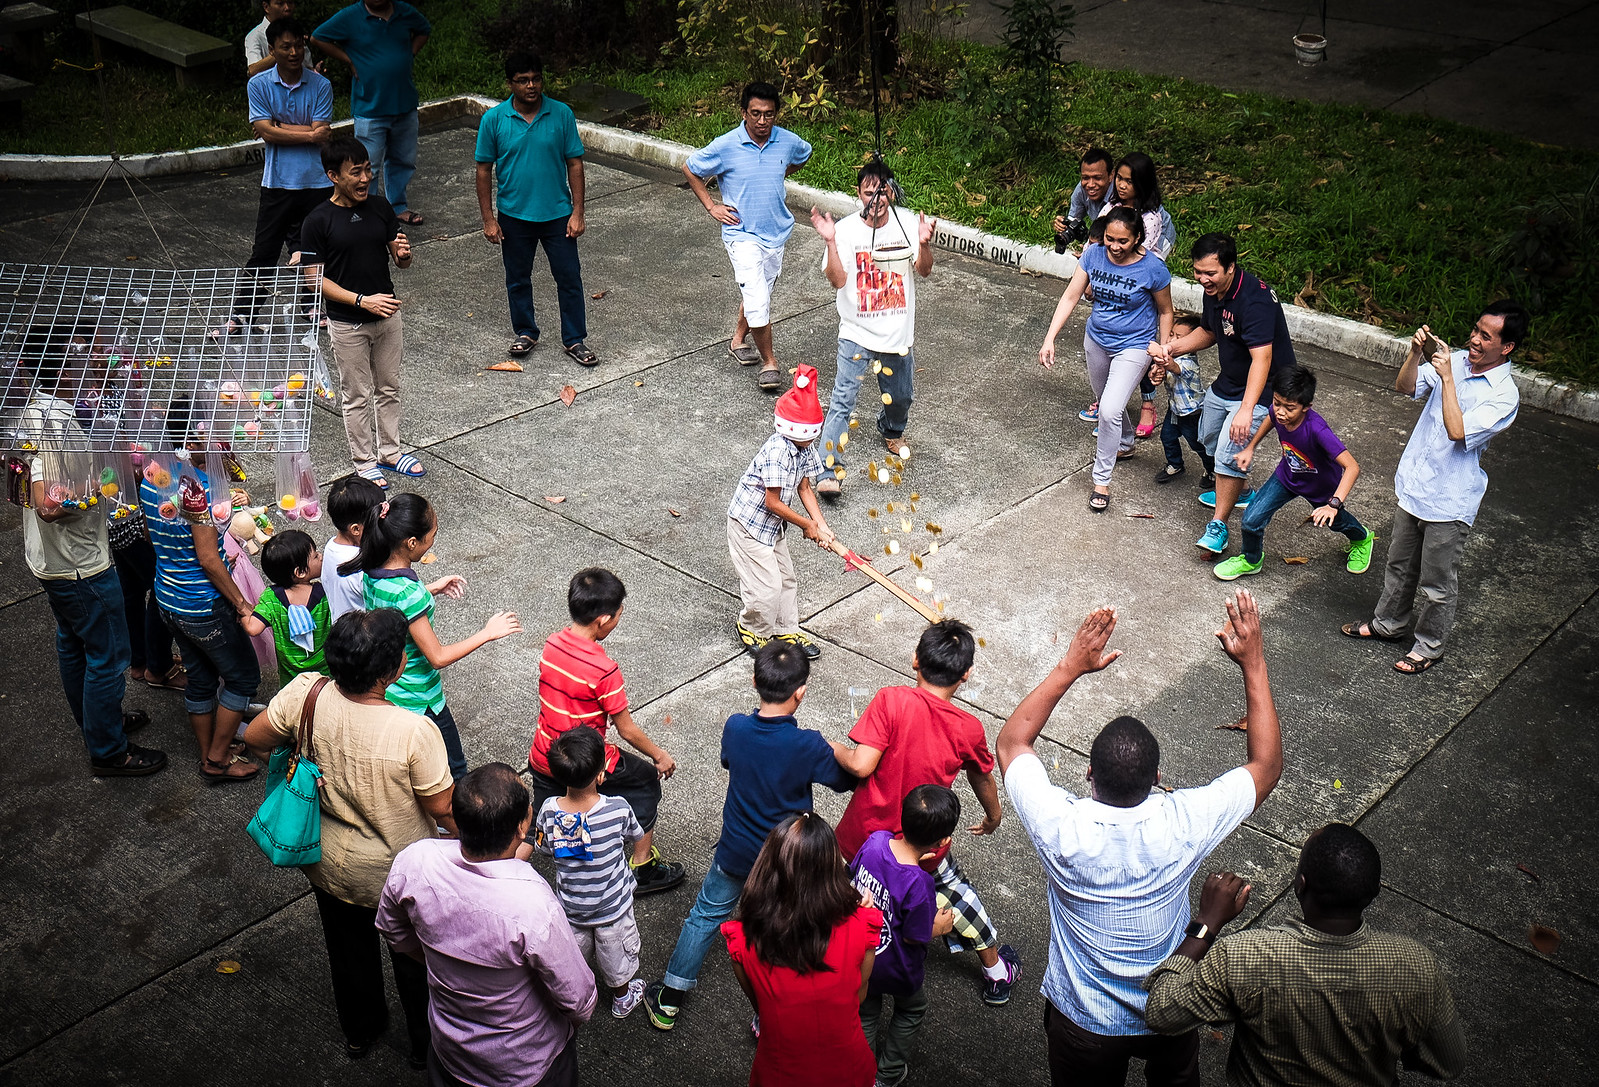 Pinata. Filipino Traditional Game